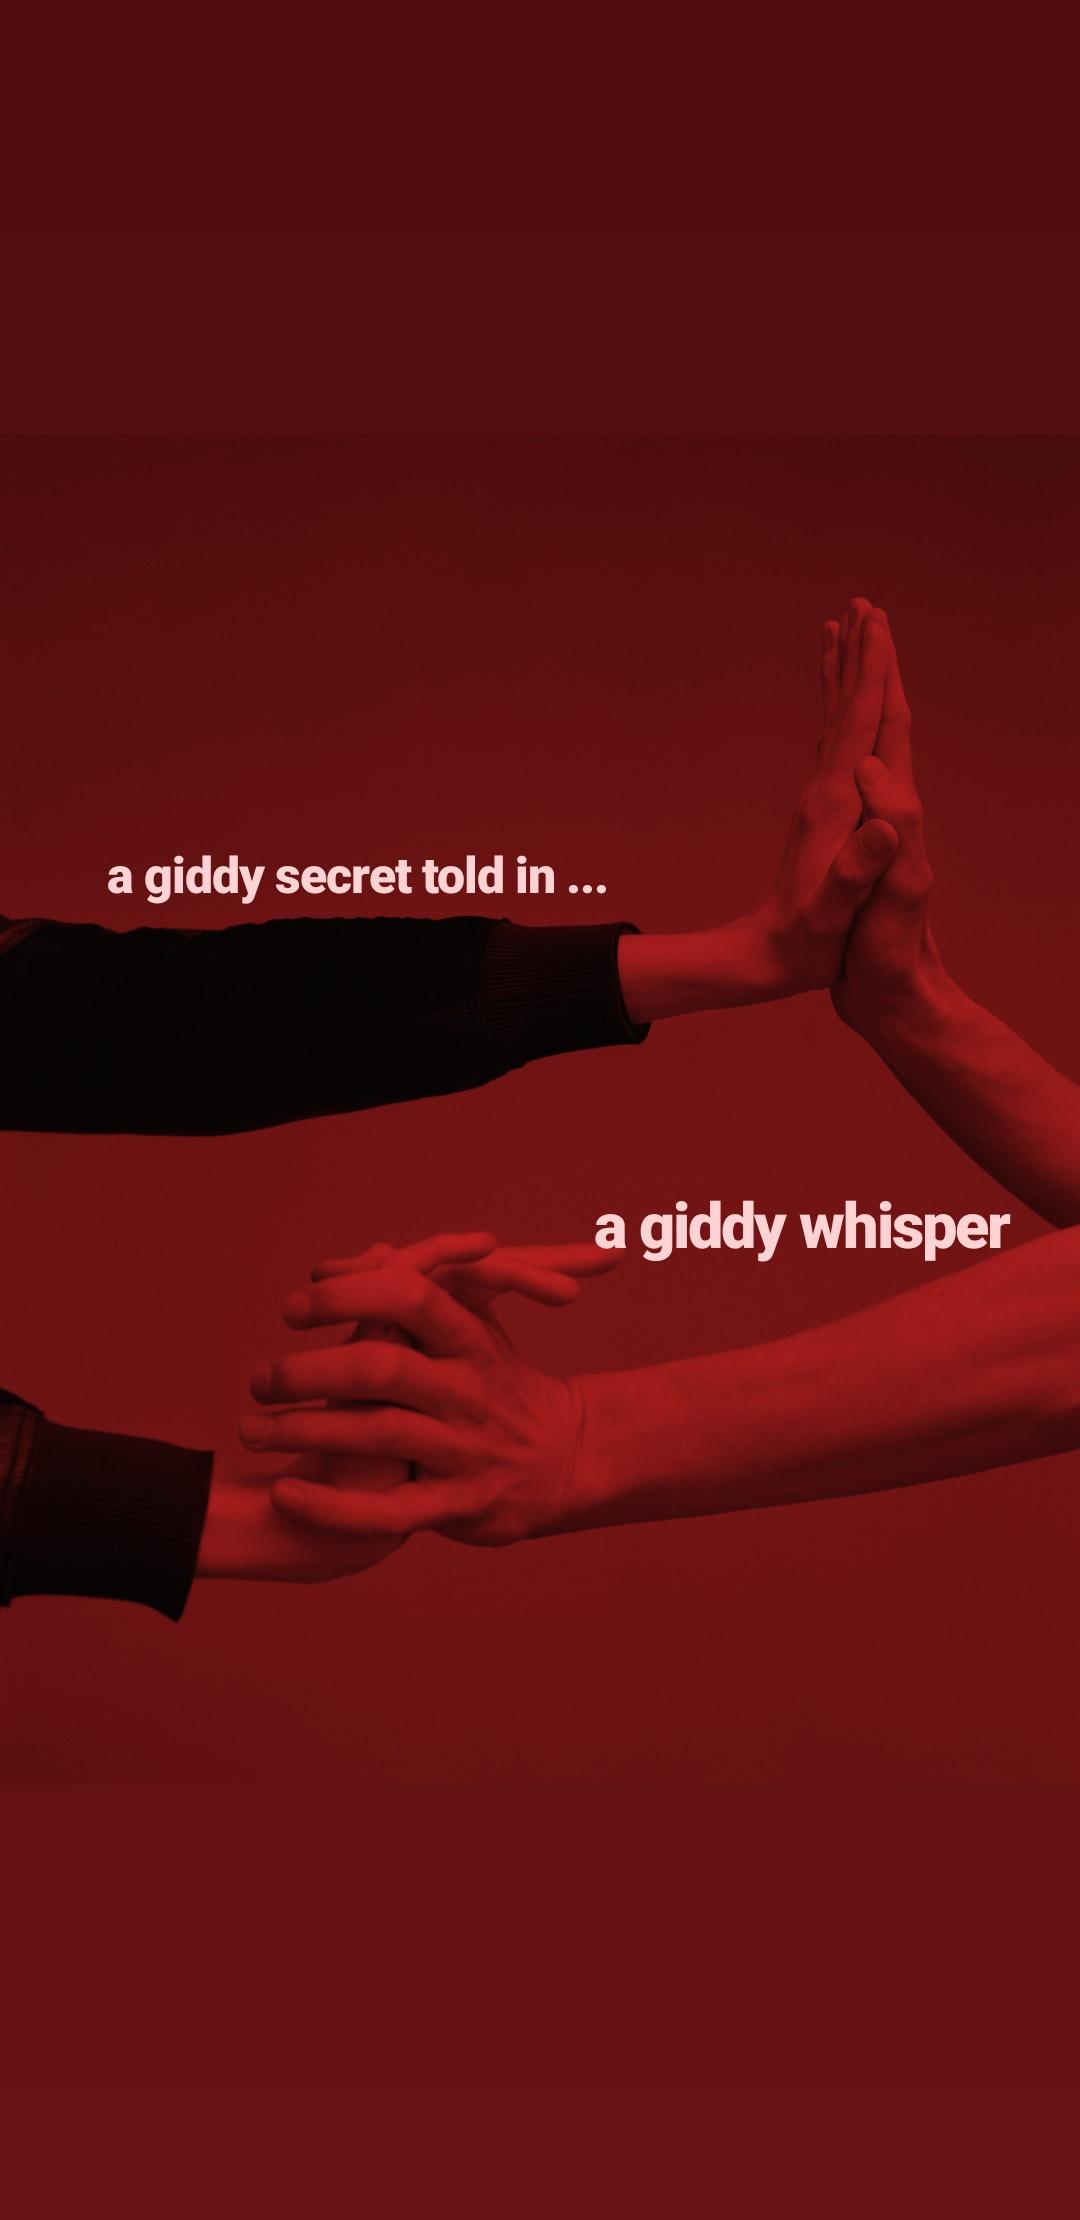 giddy secret.jpg